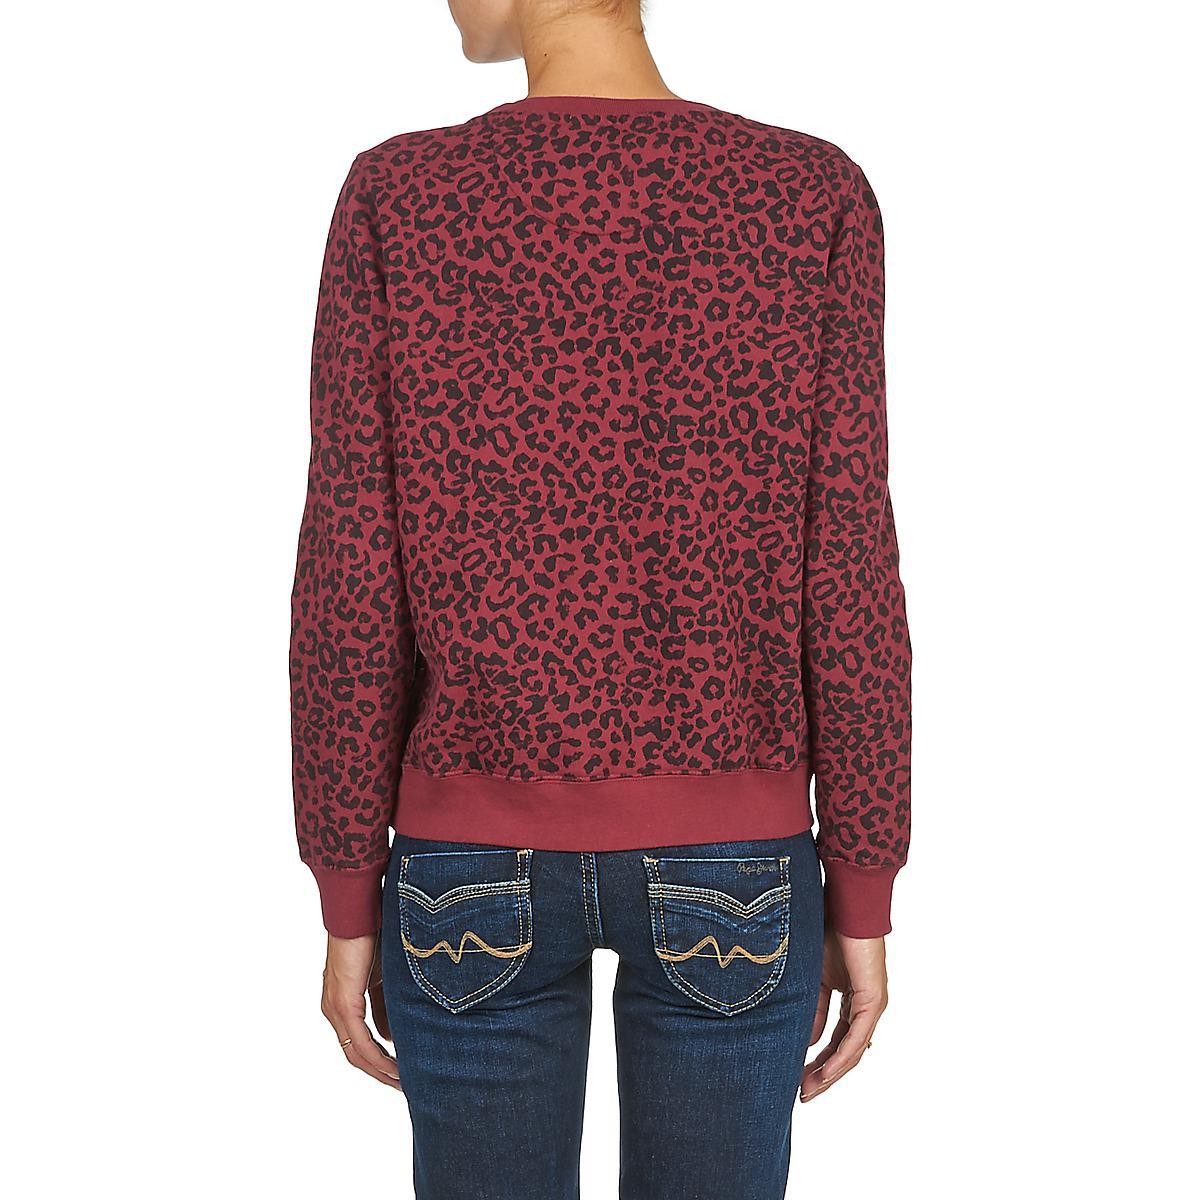 Pepe Jeans Denim Irene Women's Sweatshirt In Red